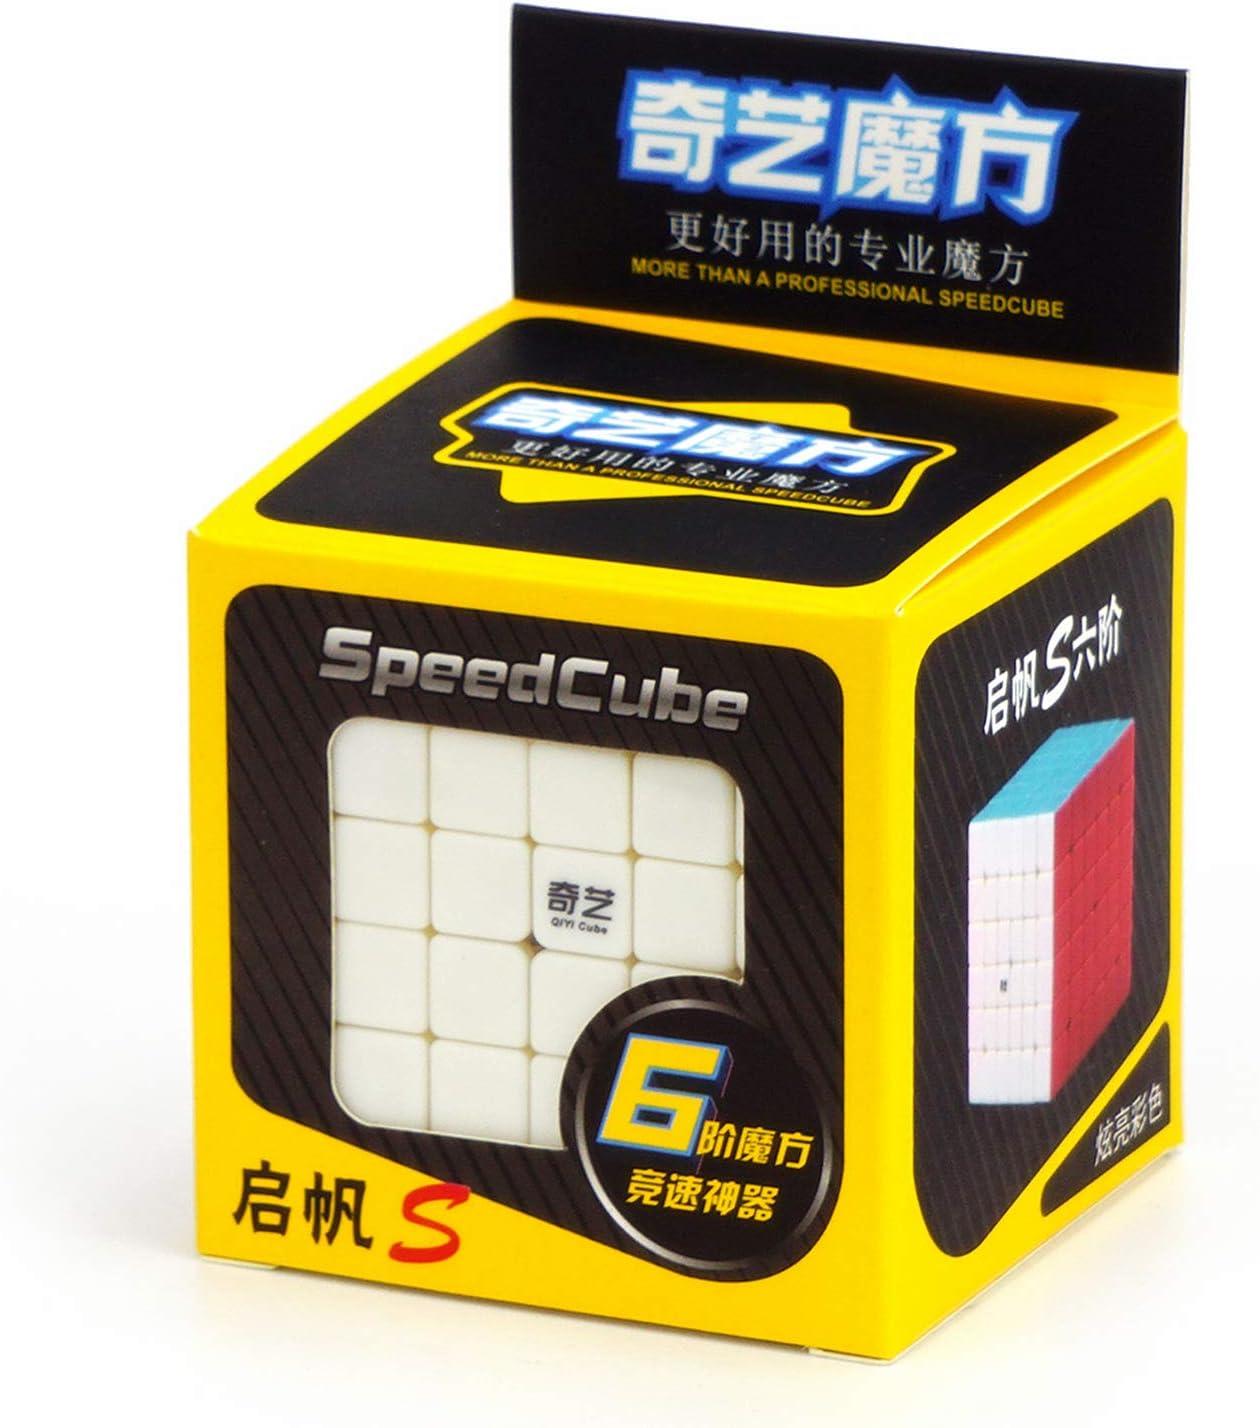 LiangCuber Qiyi 6x6 Stickerless Speed Cube Qiyi Qifan S 6x6x6 Magic Cube Puzzle Toy